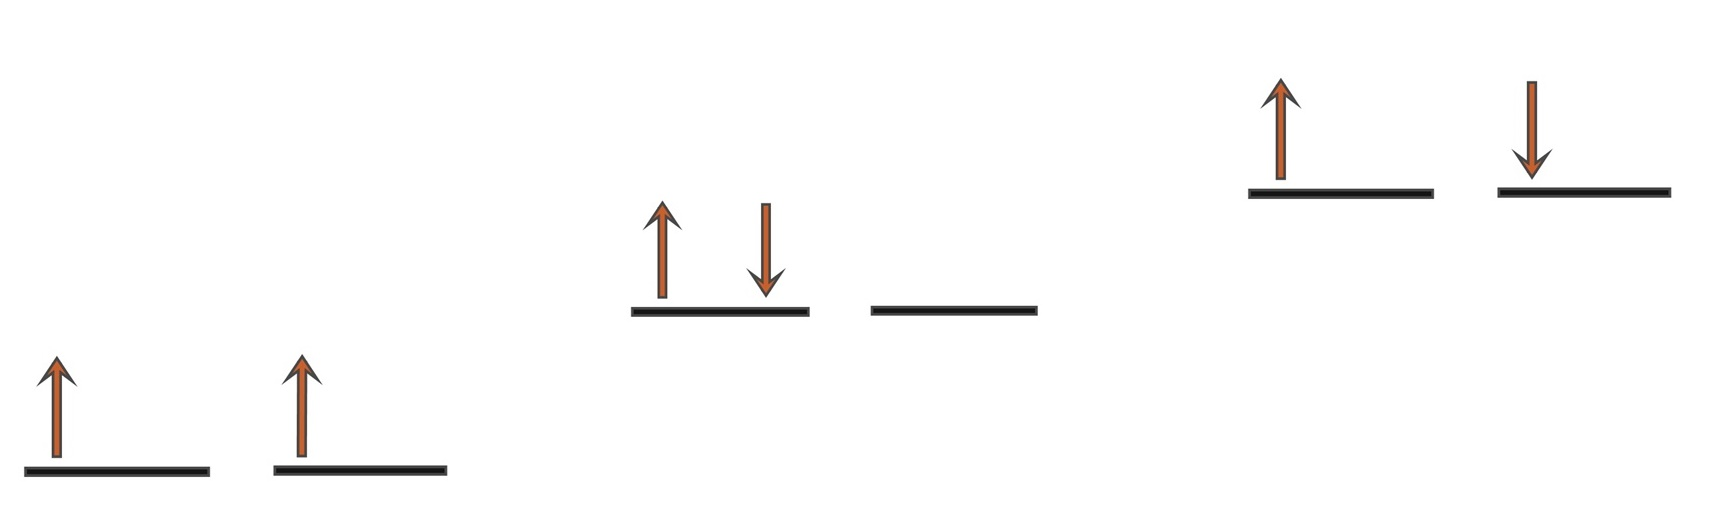 Chem1902 Oxygen Of A Pair Atoms Above Energy Level Diagrams Mo Diagram For 2e 2o